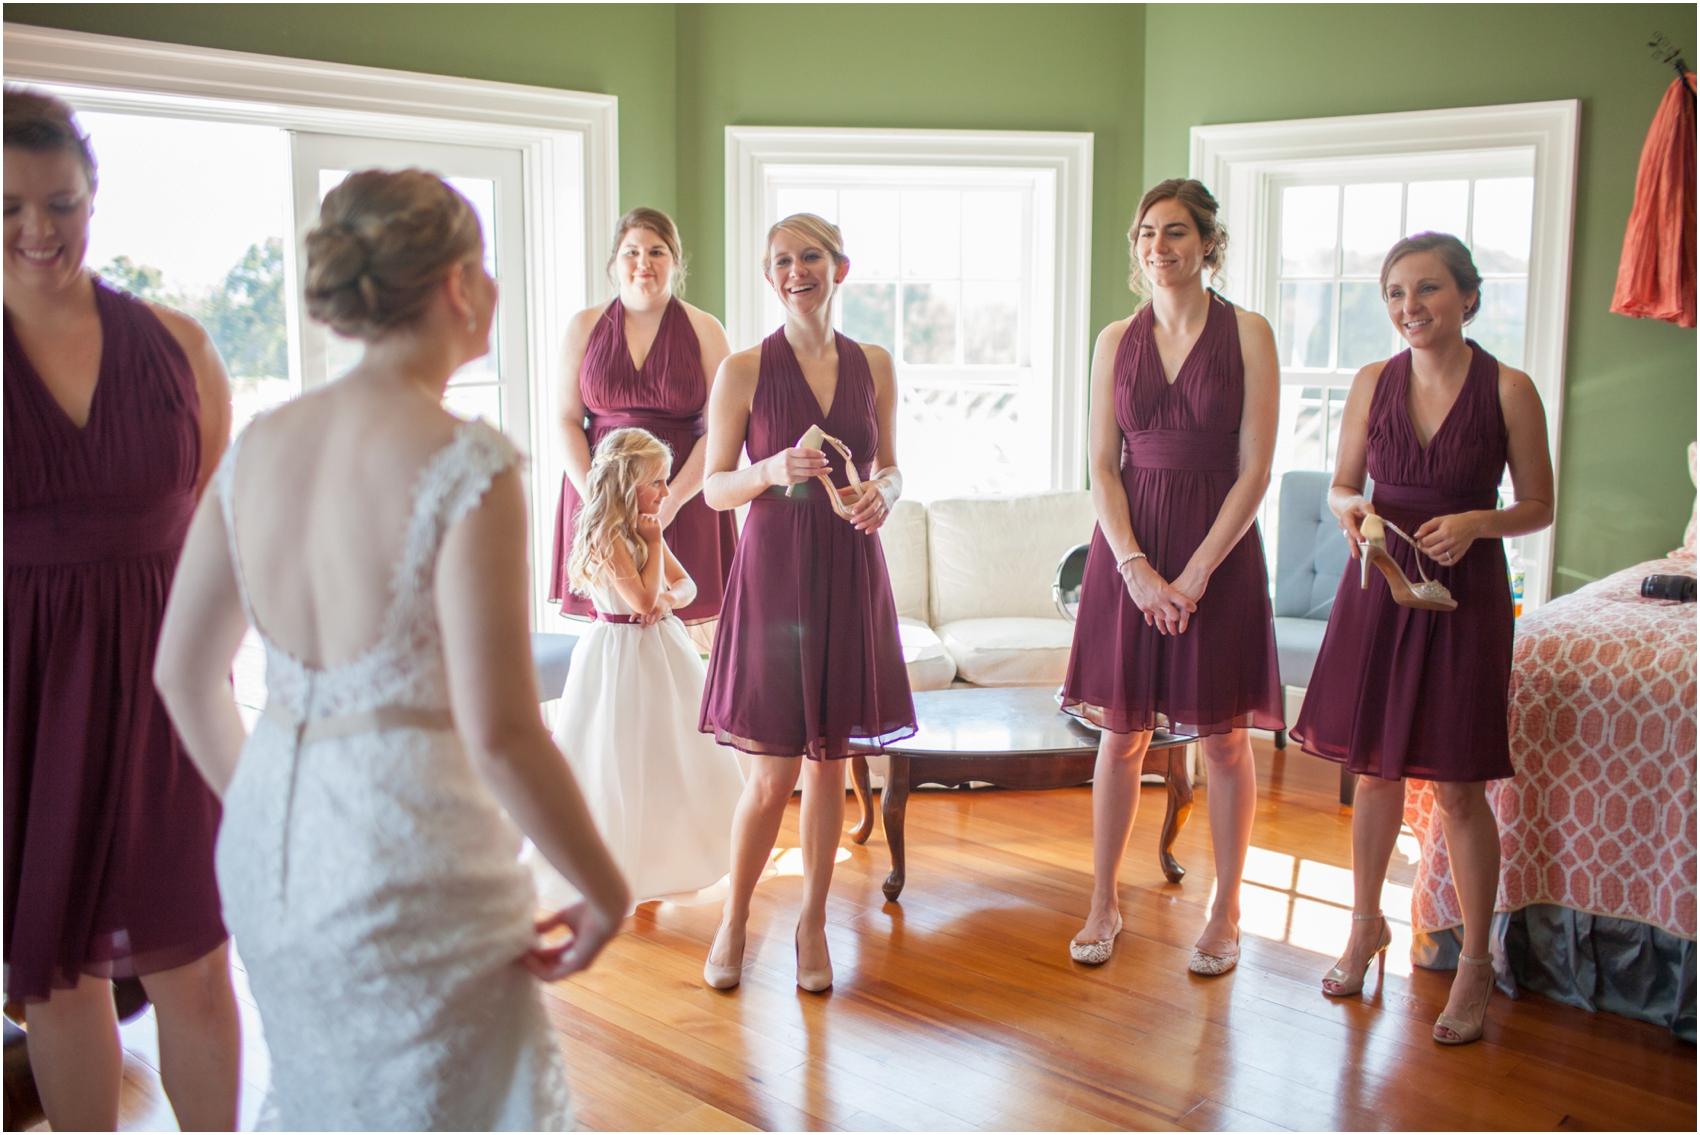 Columns-at-Six-Penny-Farm-Virginia-Fall-Wedding-7806.jpg